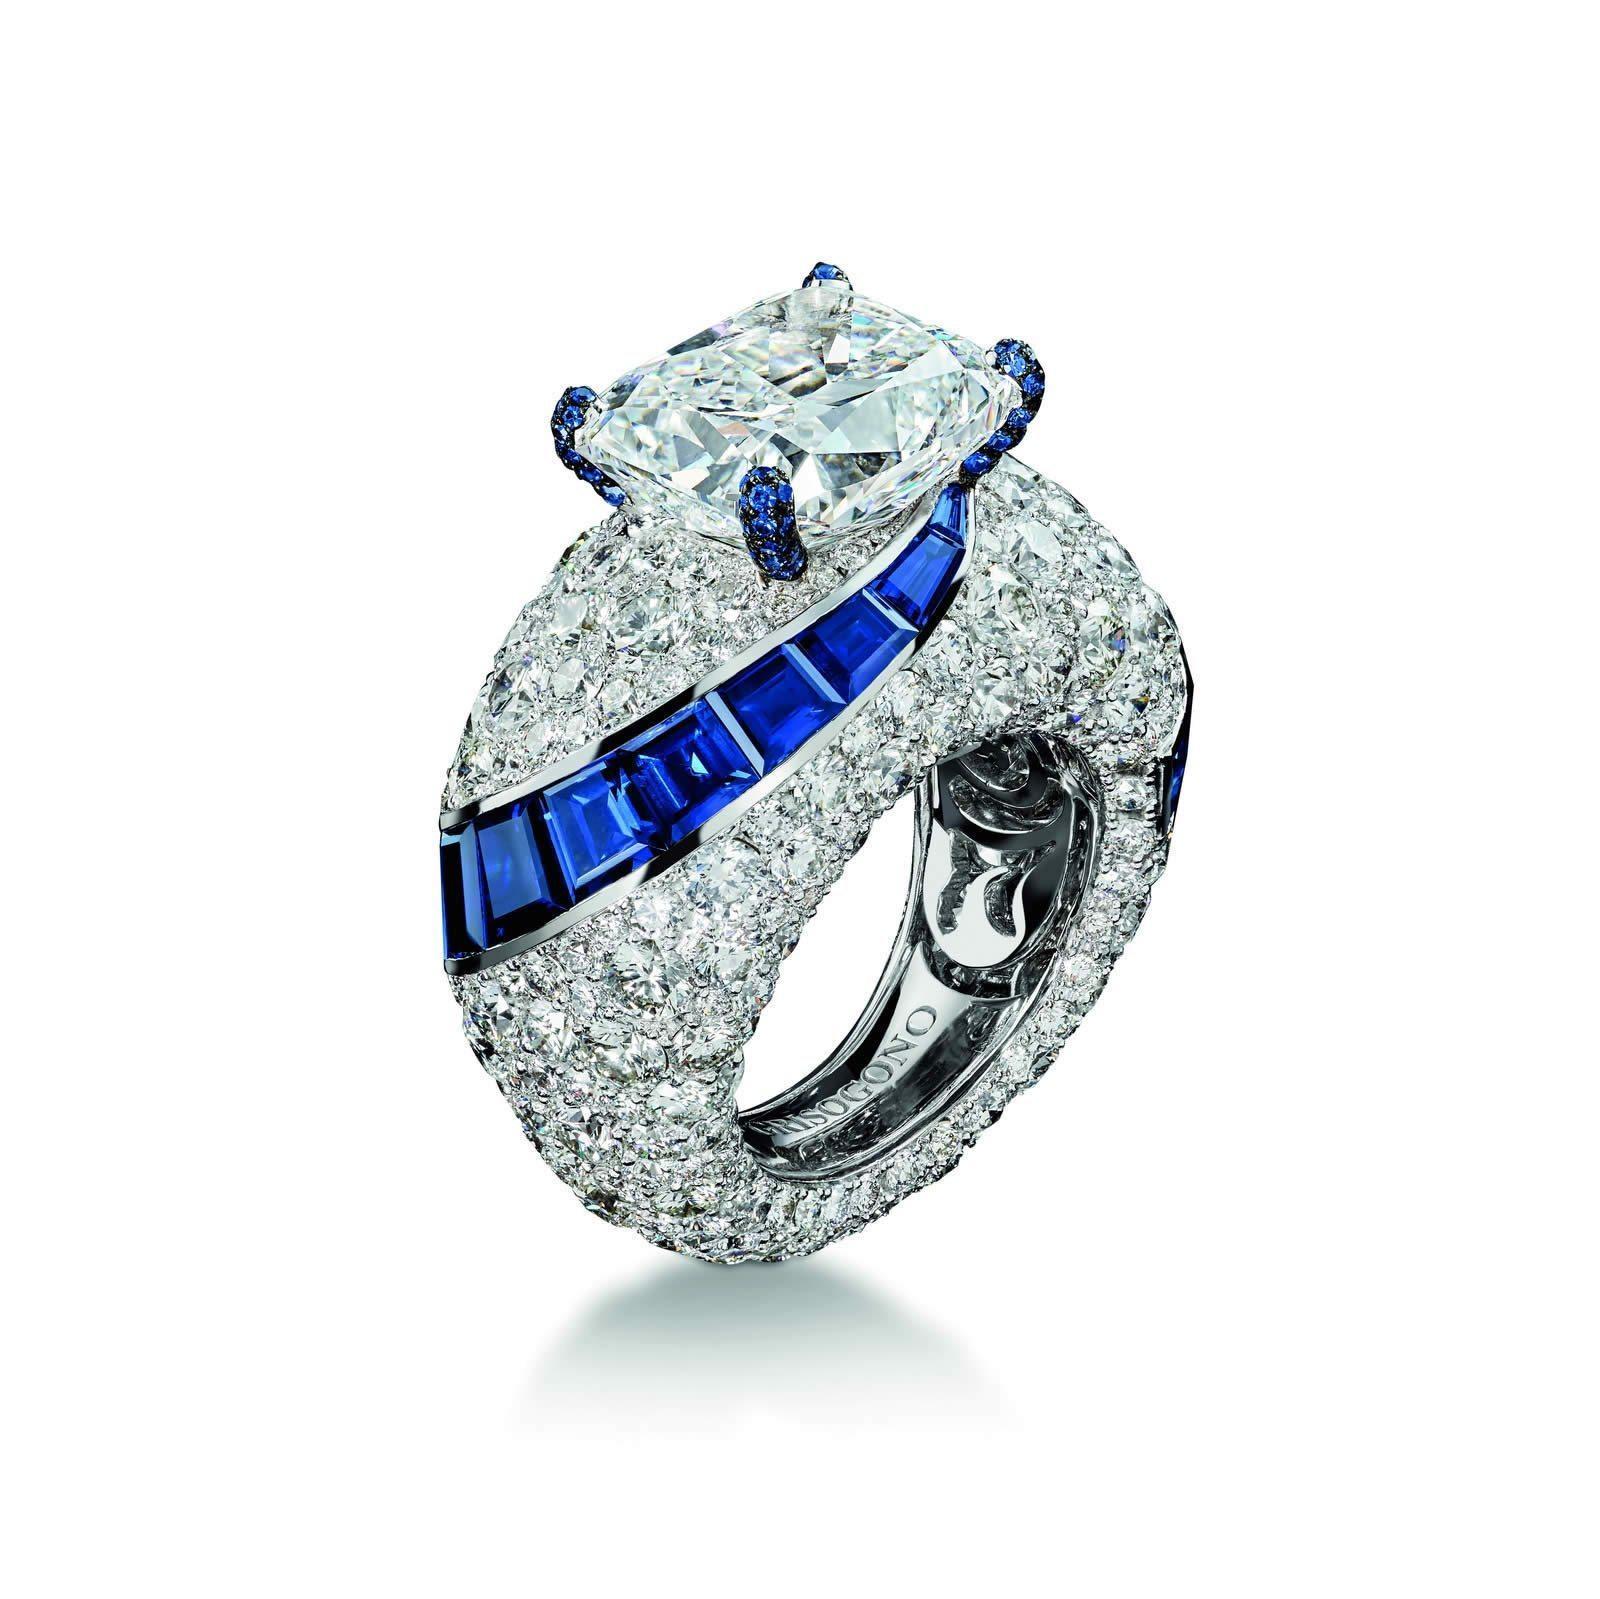 de grisogono  a genevan jeweler acquires the most